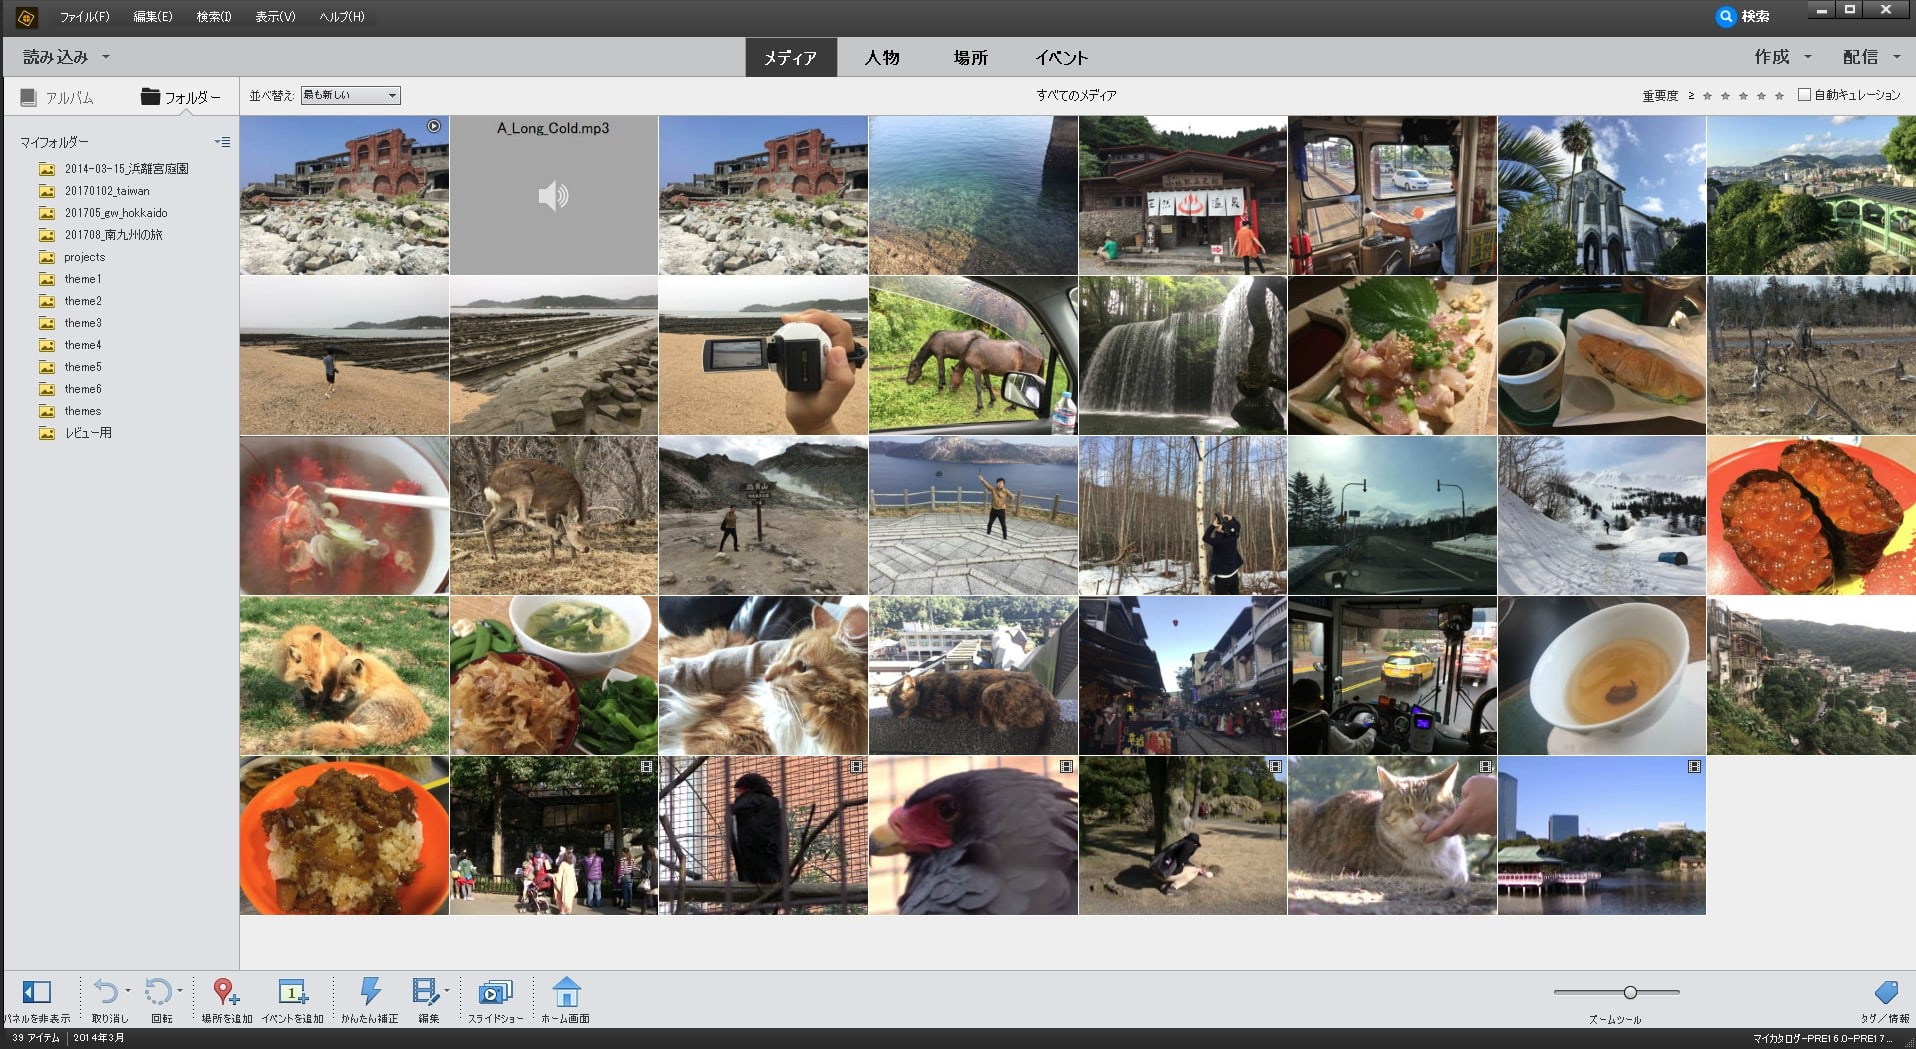 Elements Organizer Adobe Premiere Elements2019の使い方(1) 機能の紹介 動画編集ソフト アドビプレミアエレメンツ入門